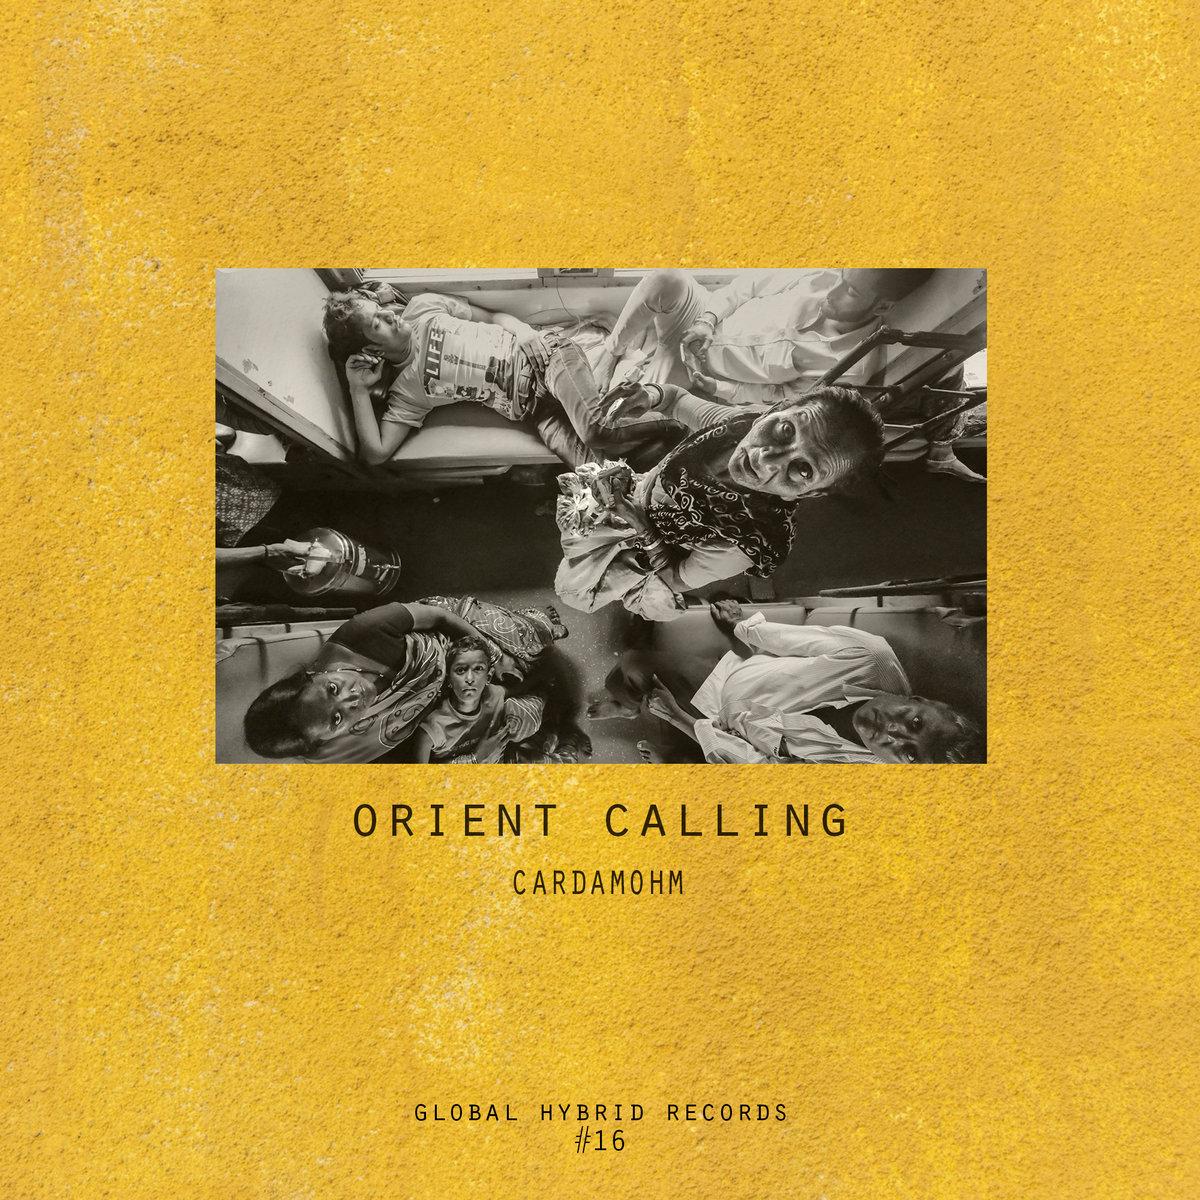 Cardamohm - Orient Calling artwork